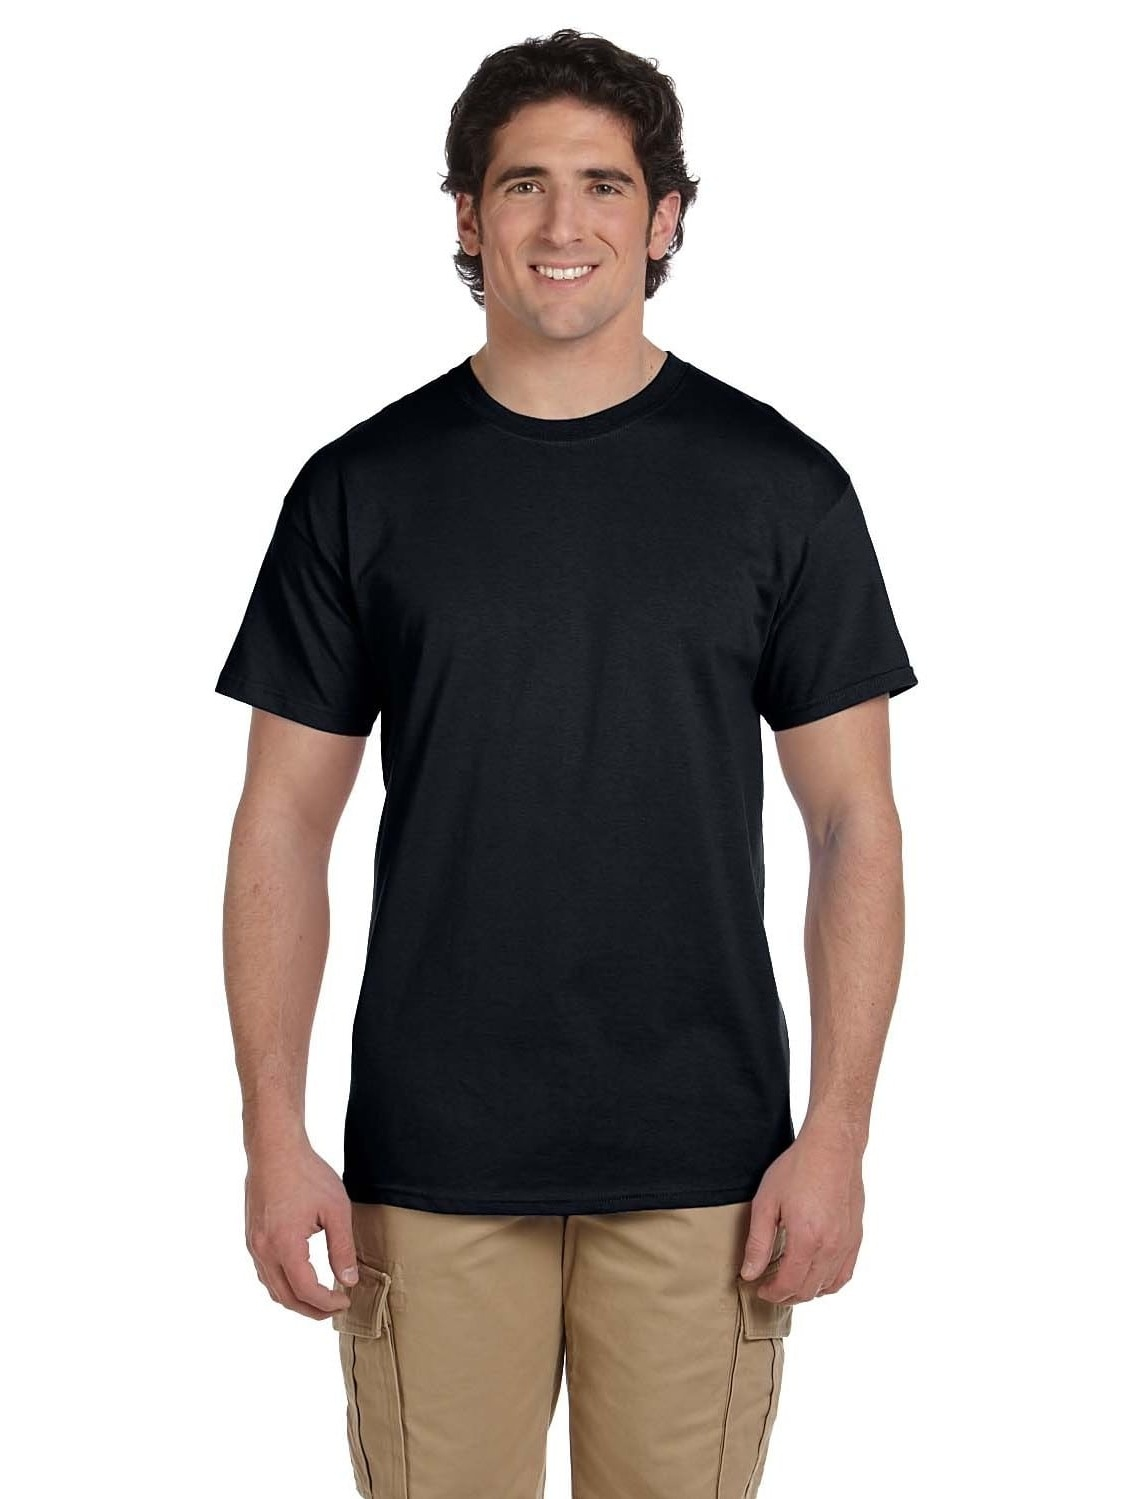 Gildan  Men's Ultra Cotton Tall Short Sleeve Undershirts (Pack of 12)